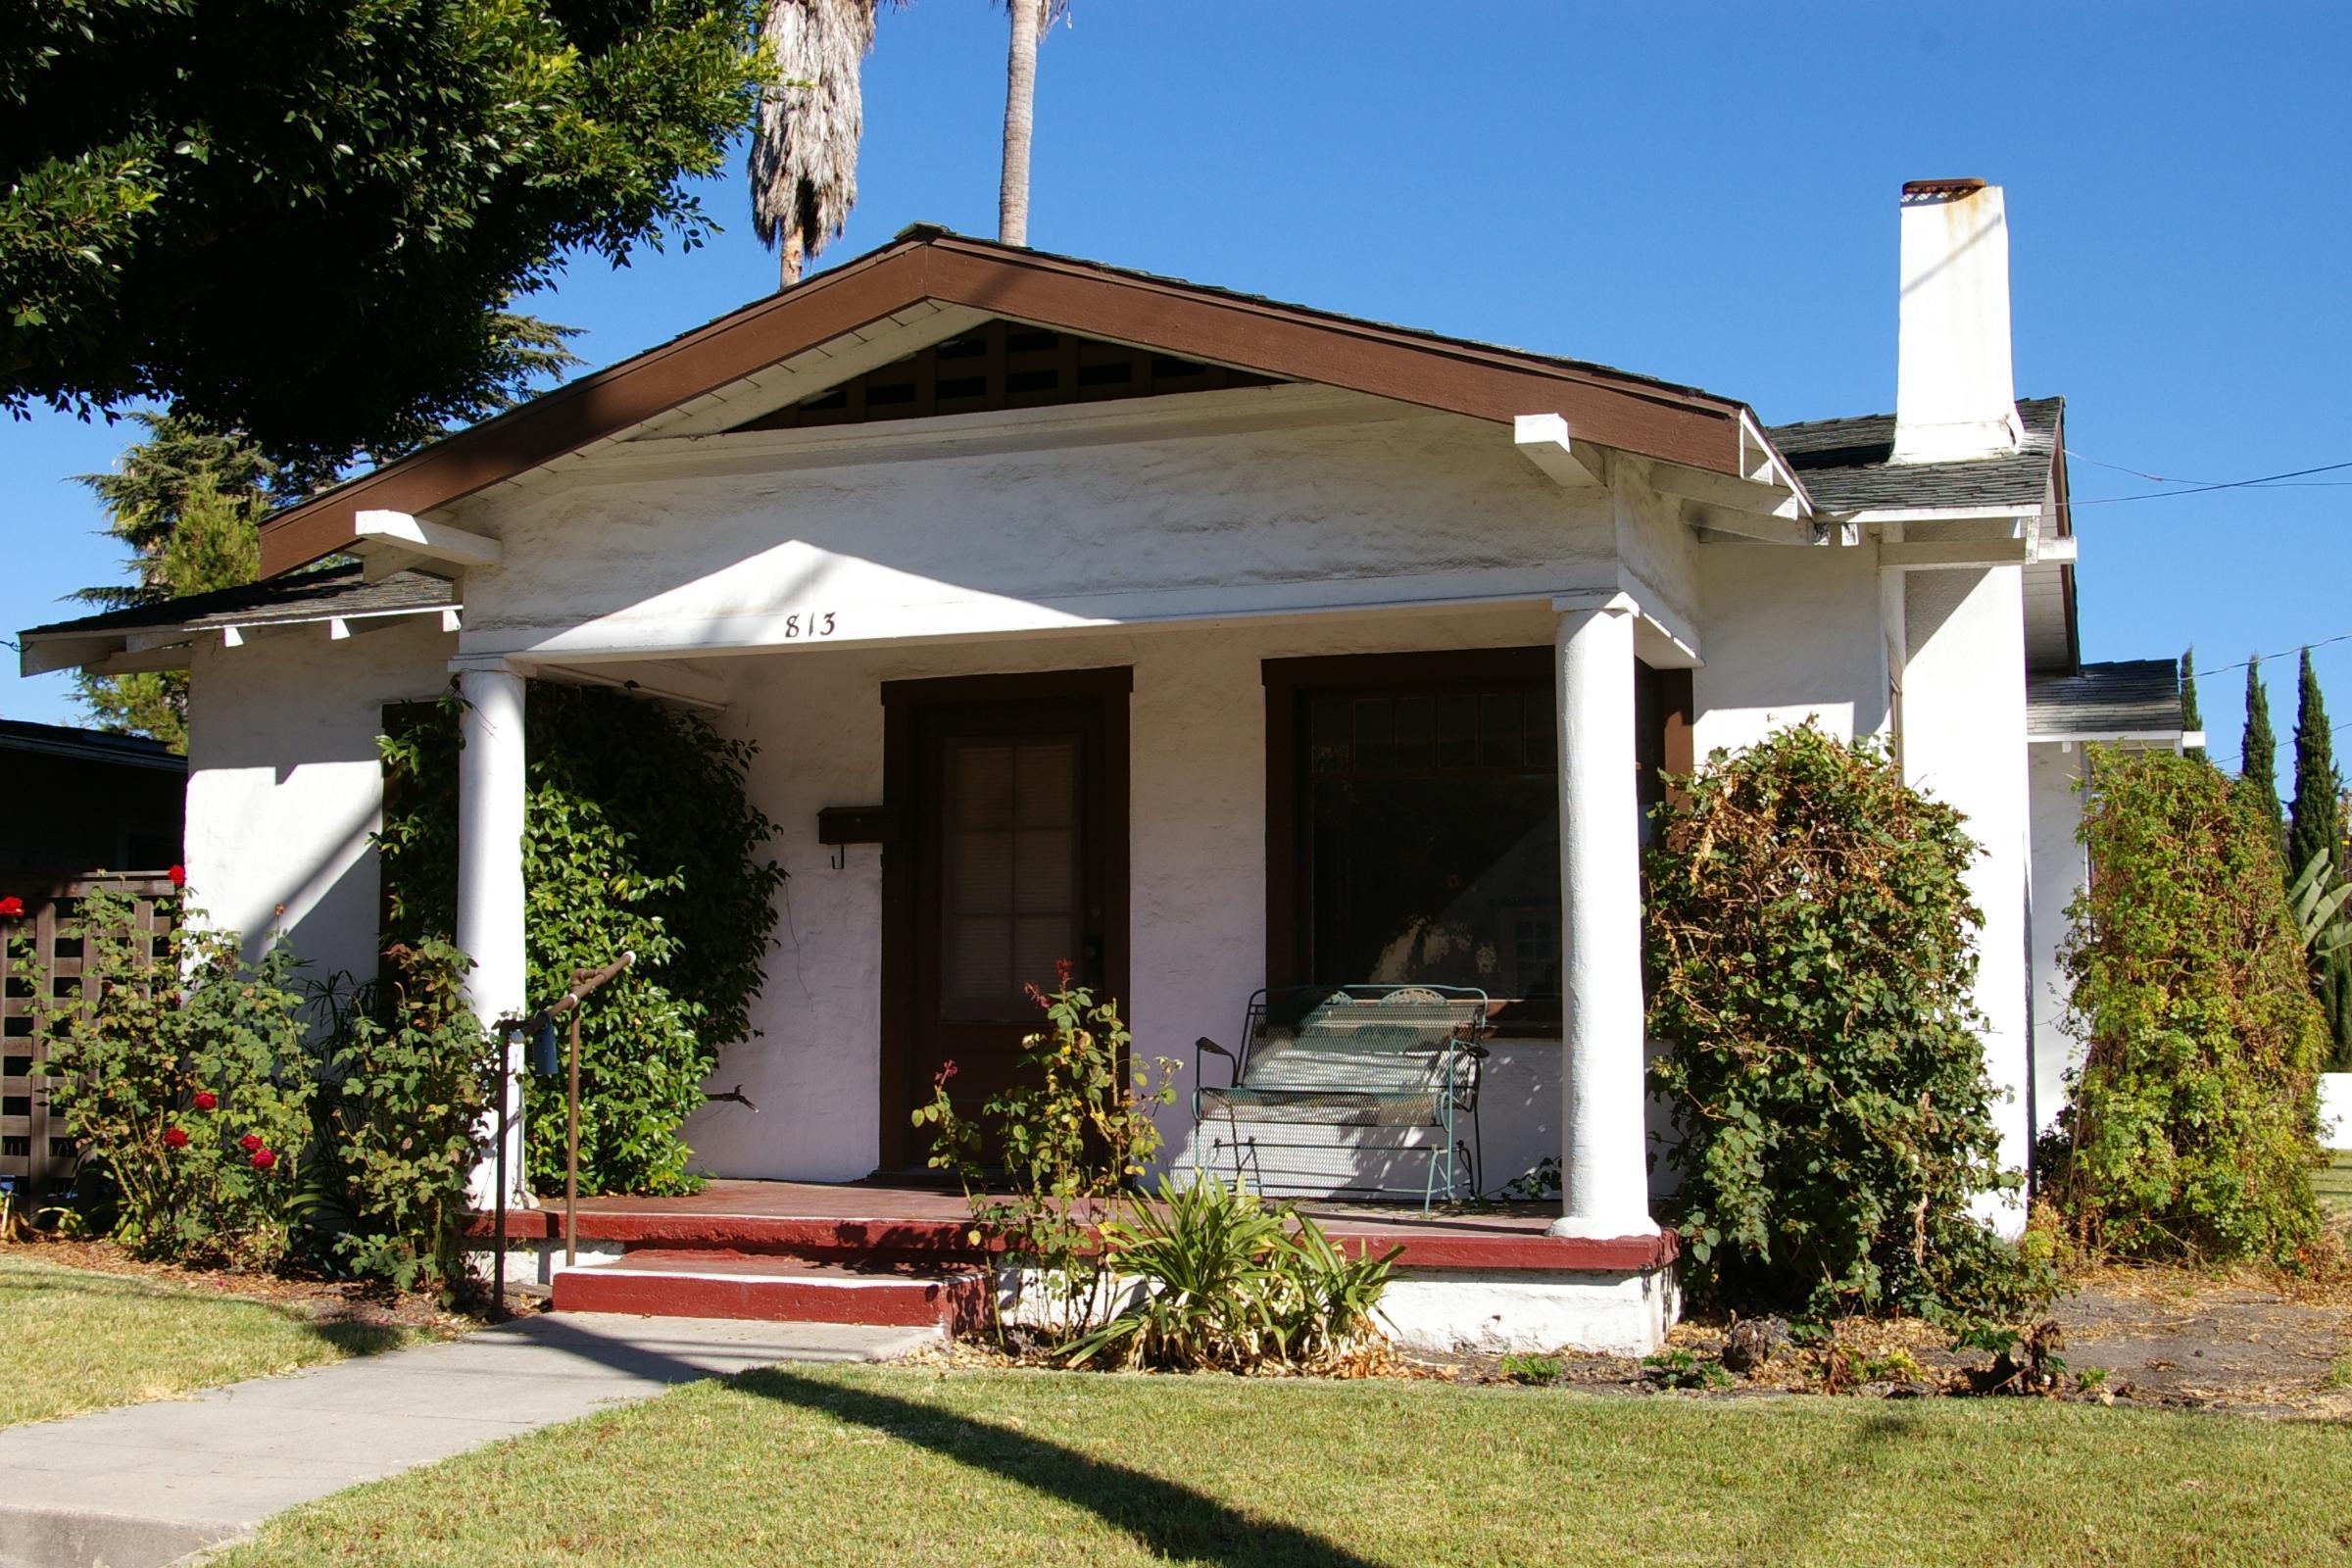 Property photo for 813 W Valerio St Santa Barbara, California 93101 - 13-2789